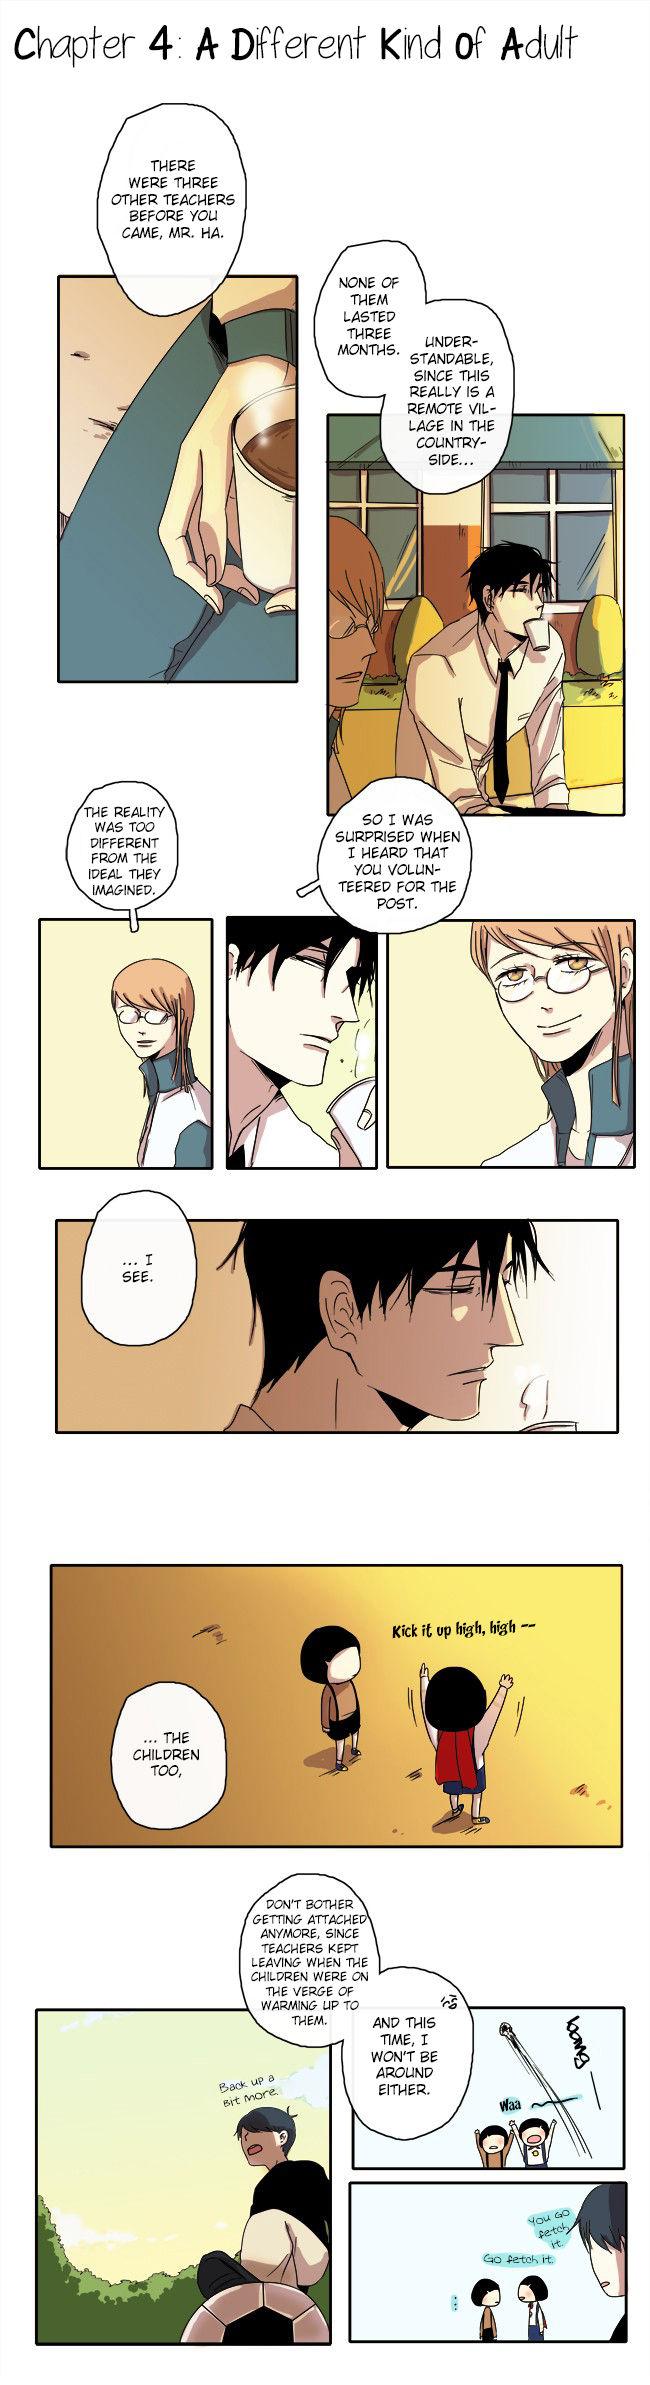 The Children's Teacher, Mr. Kwon 4 Page 2